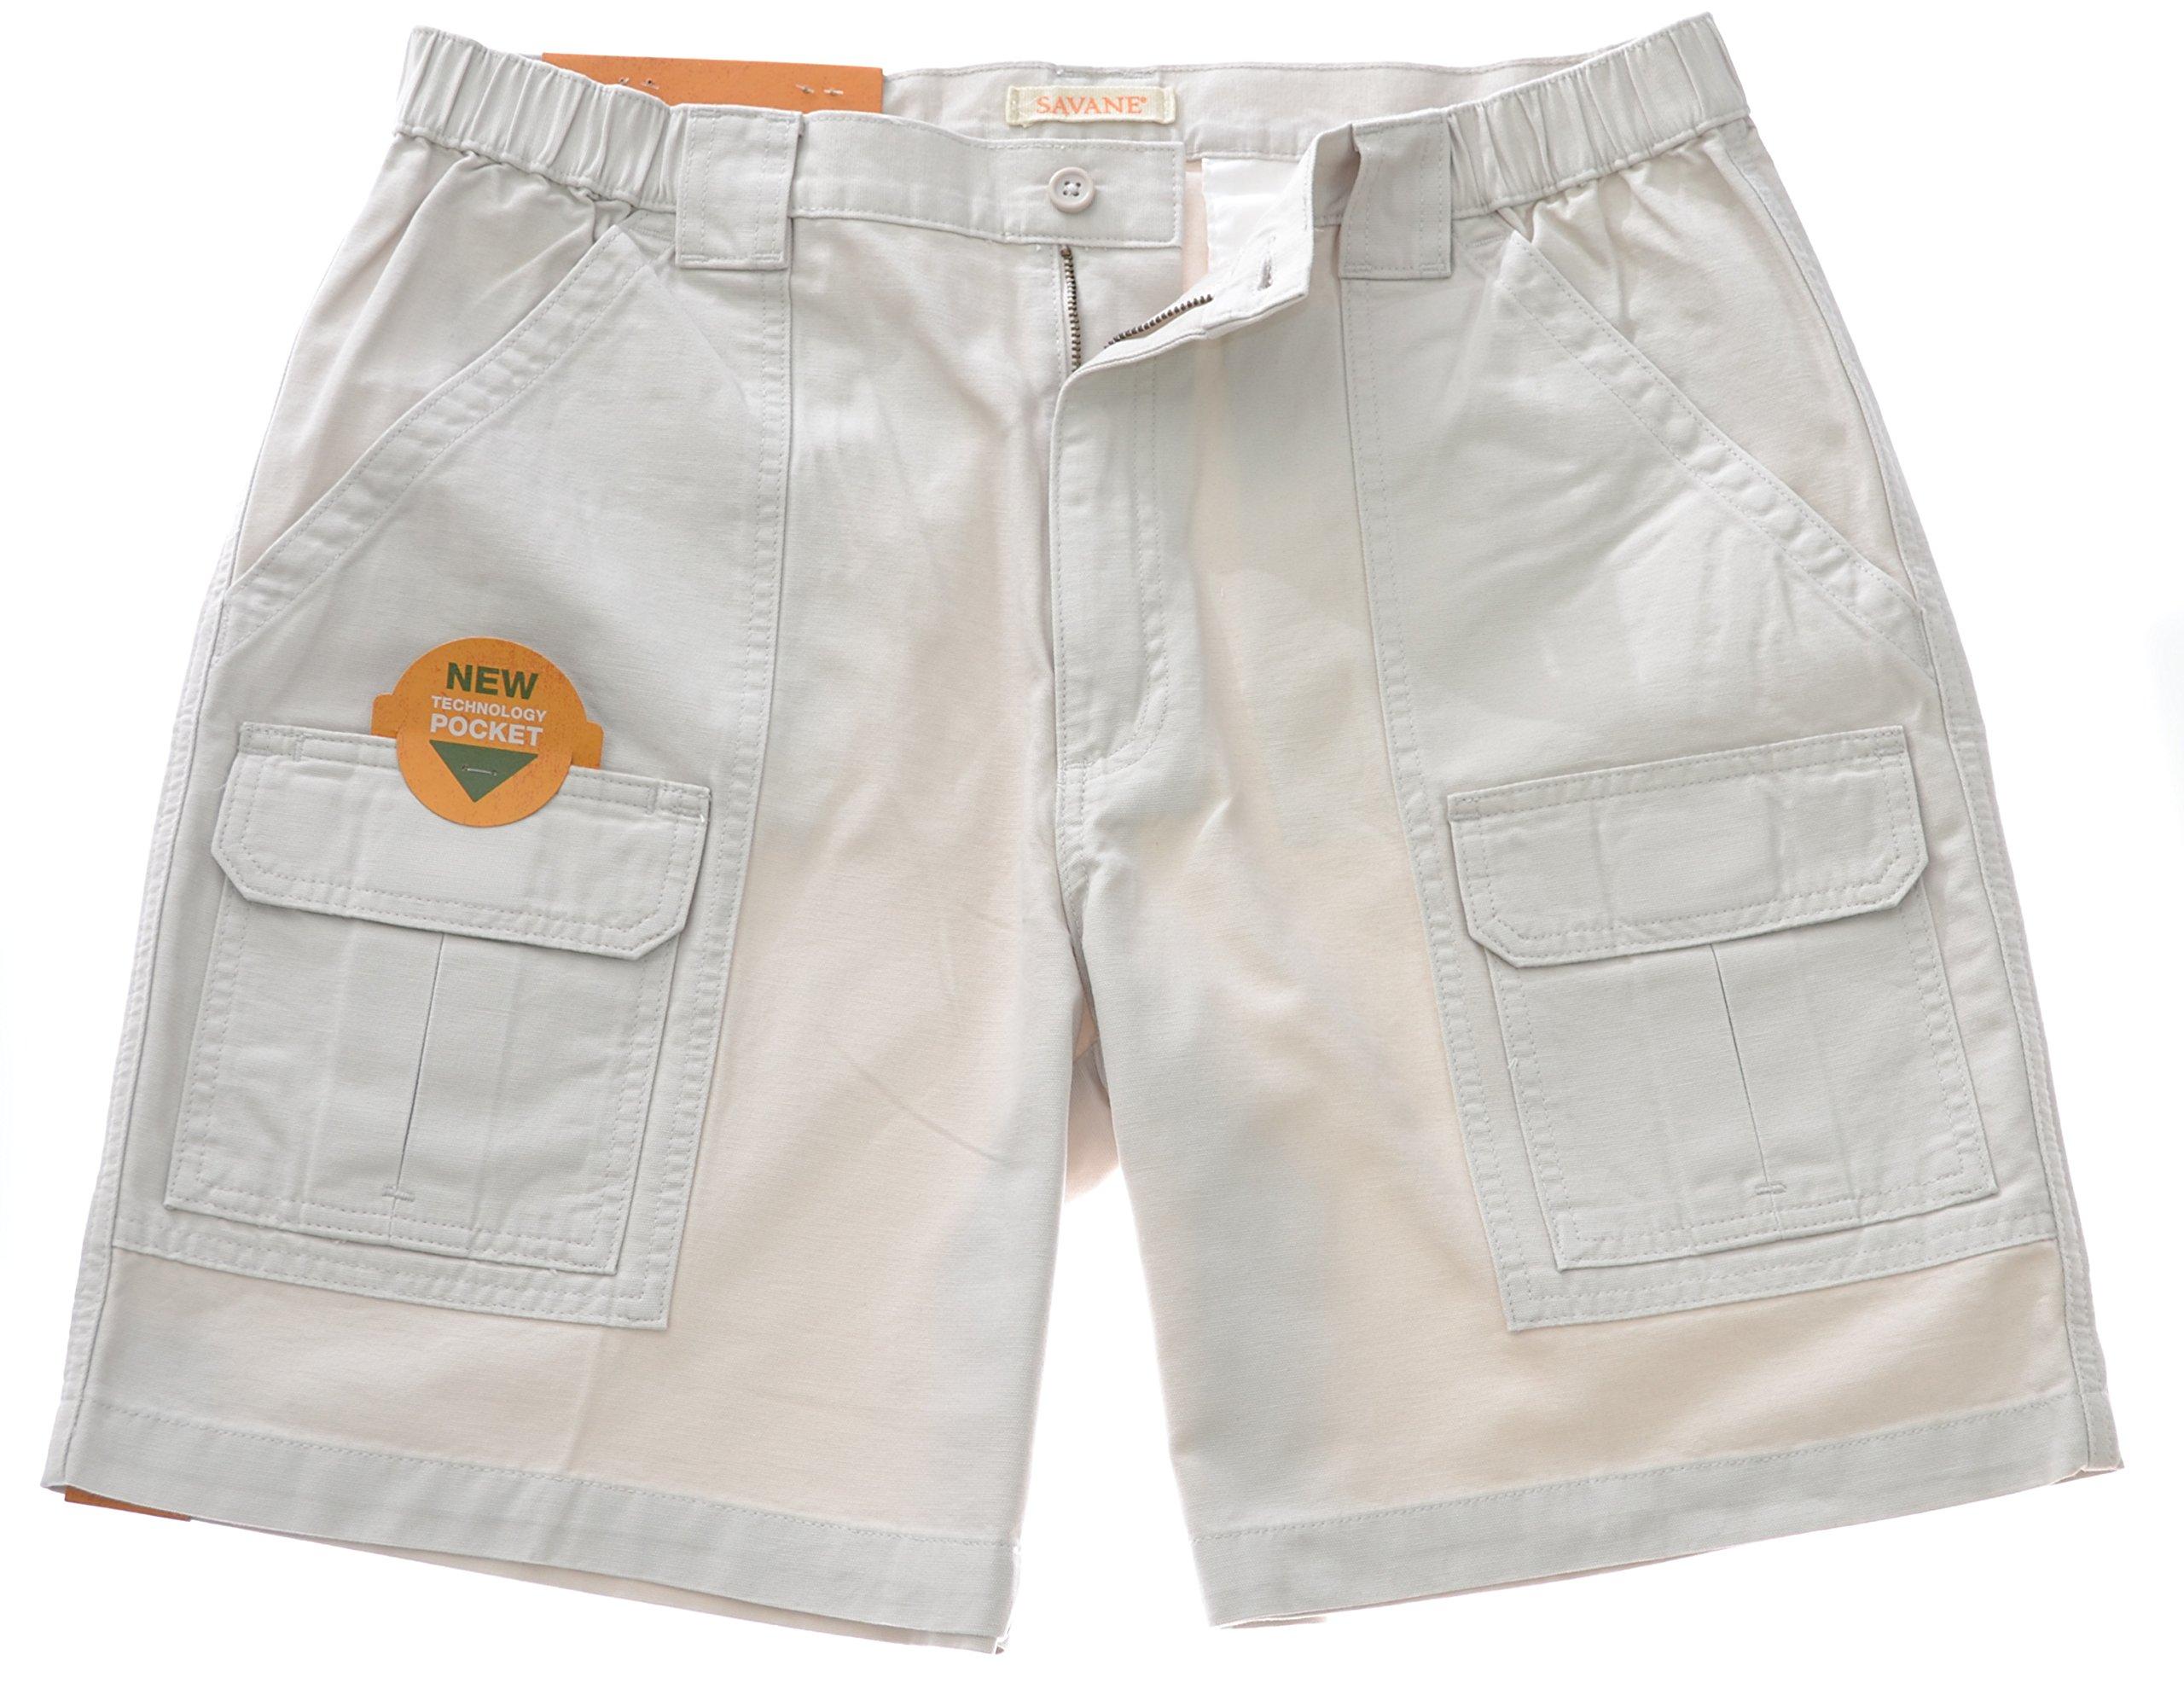 Savane Men's Comfort Hiking Cargo Shorts (32, Stone-16) by Savane